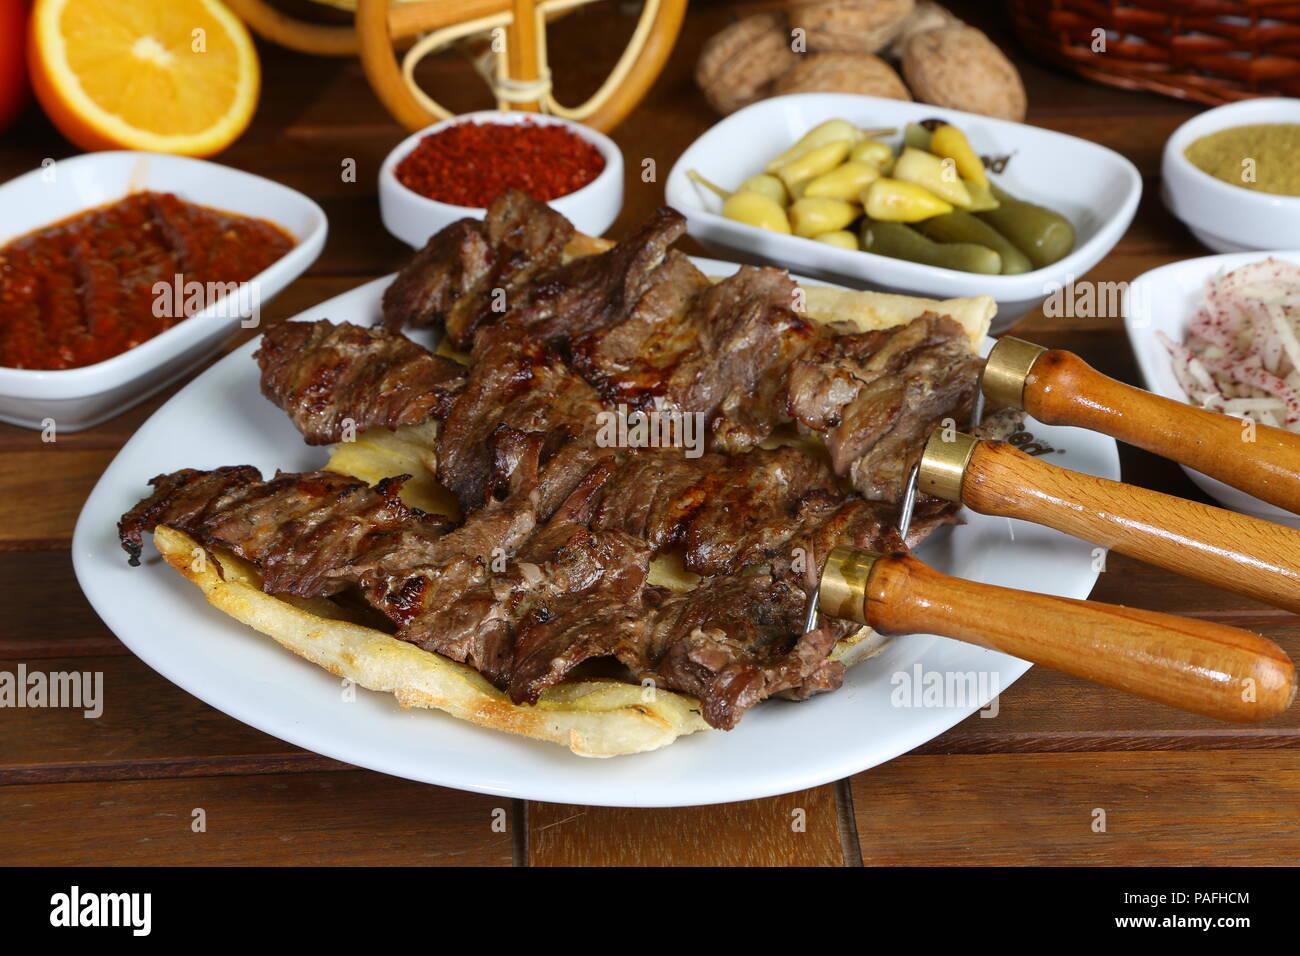 https www alamy com turkish cag kebab doner in plate image213013940 html